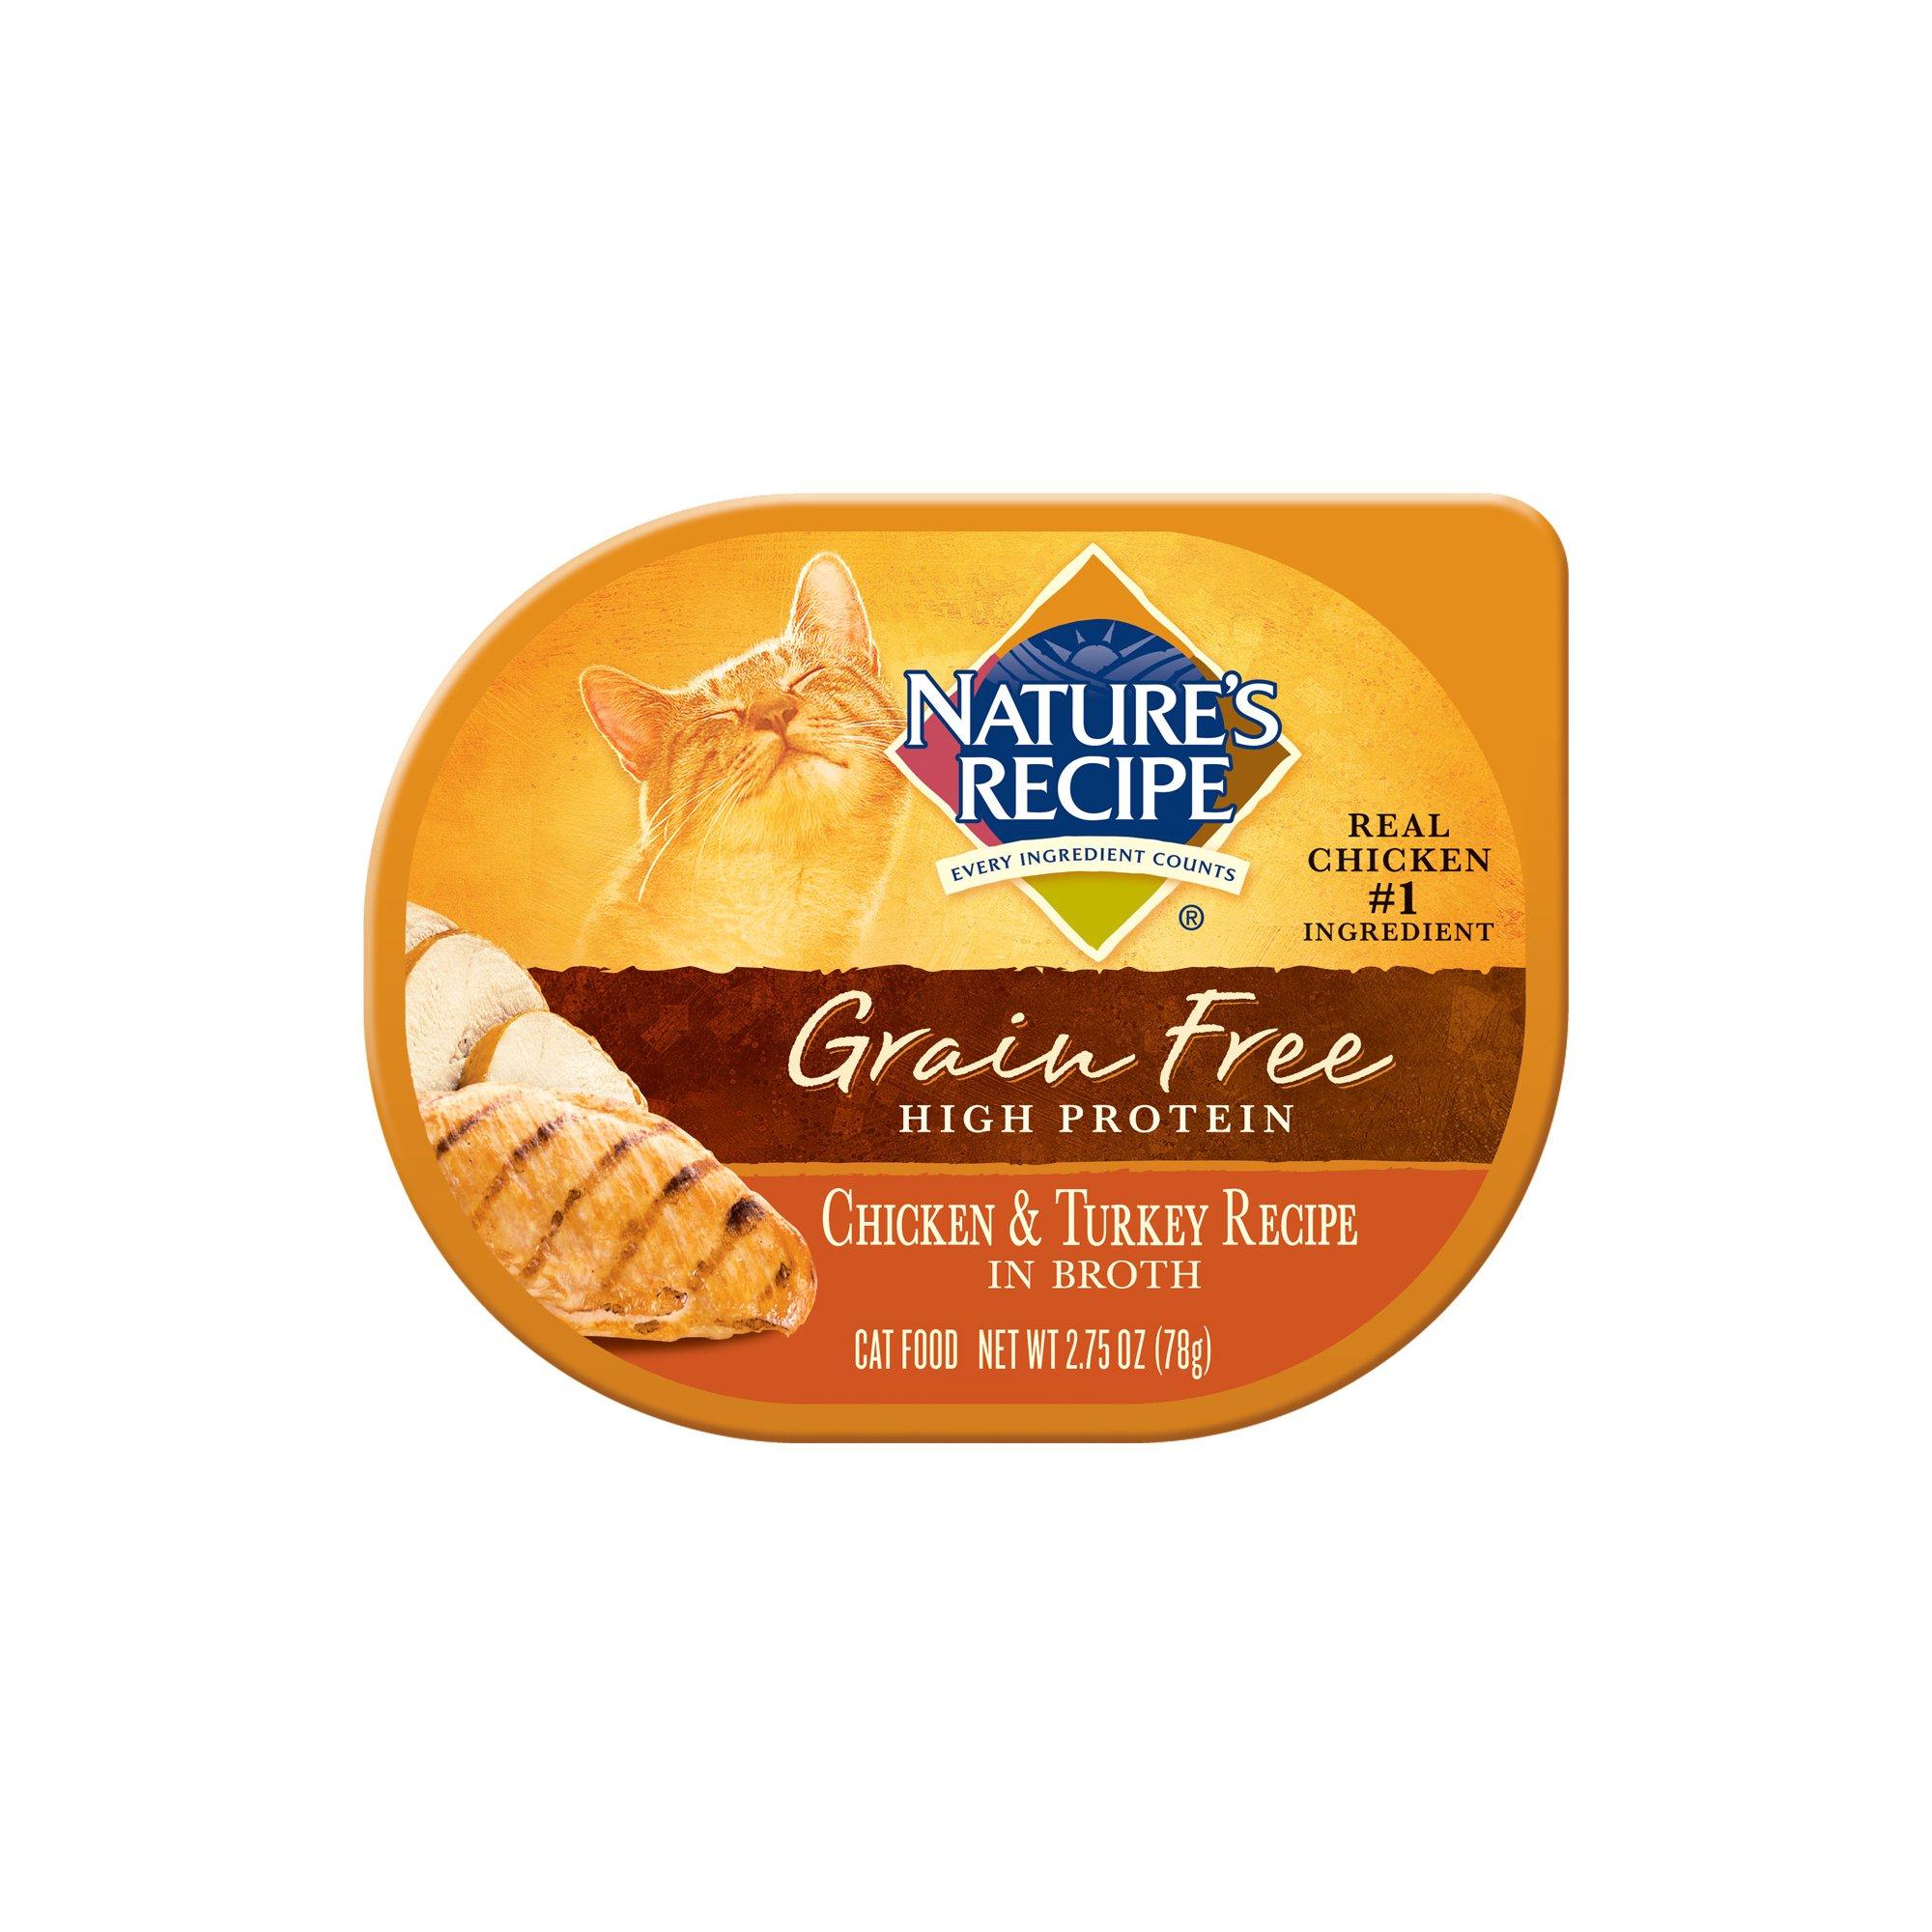 Nature's Recipe Grain Free Chicken & Turkey Adult Cat Food Trays